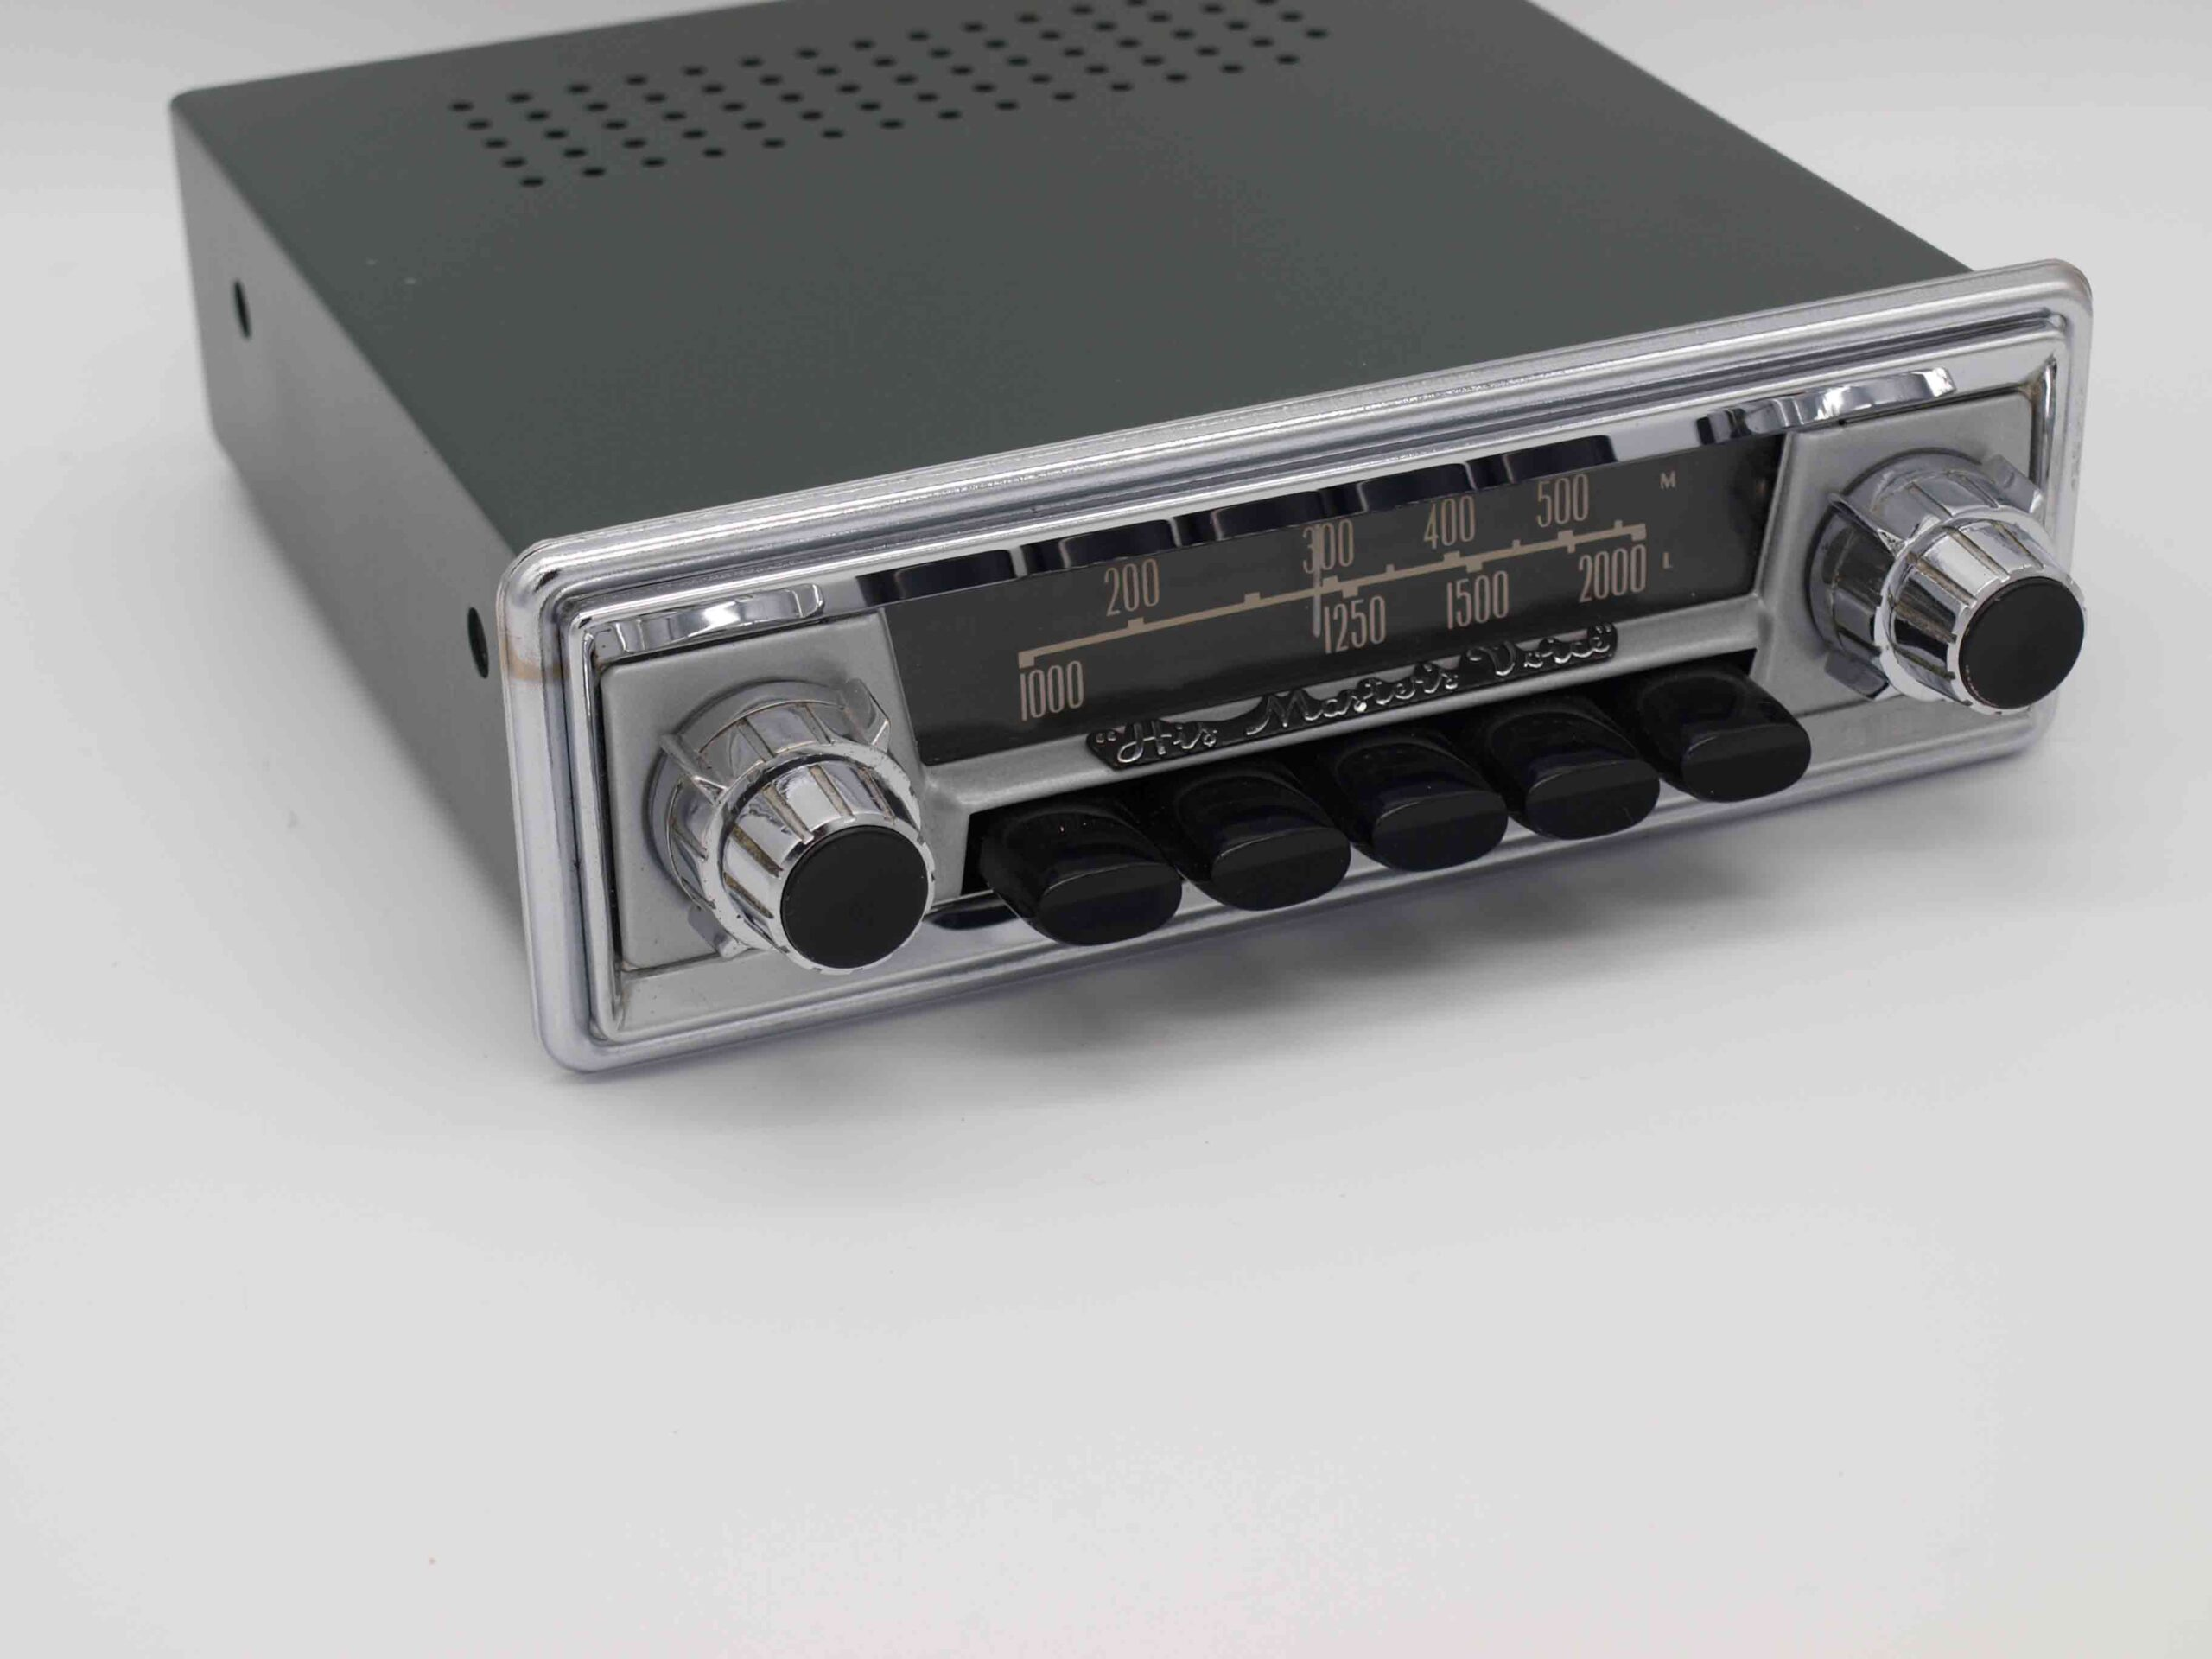 Radiomobile (HMV) 500T FM